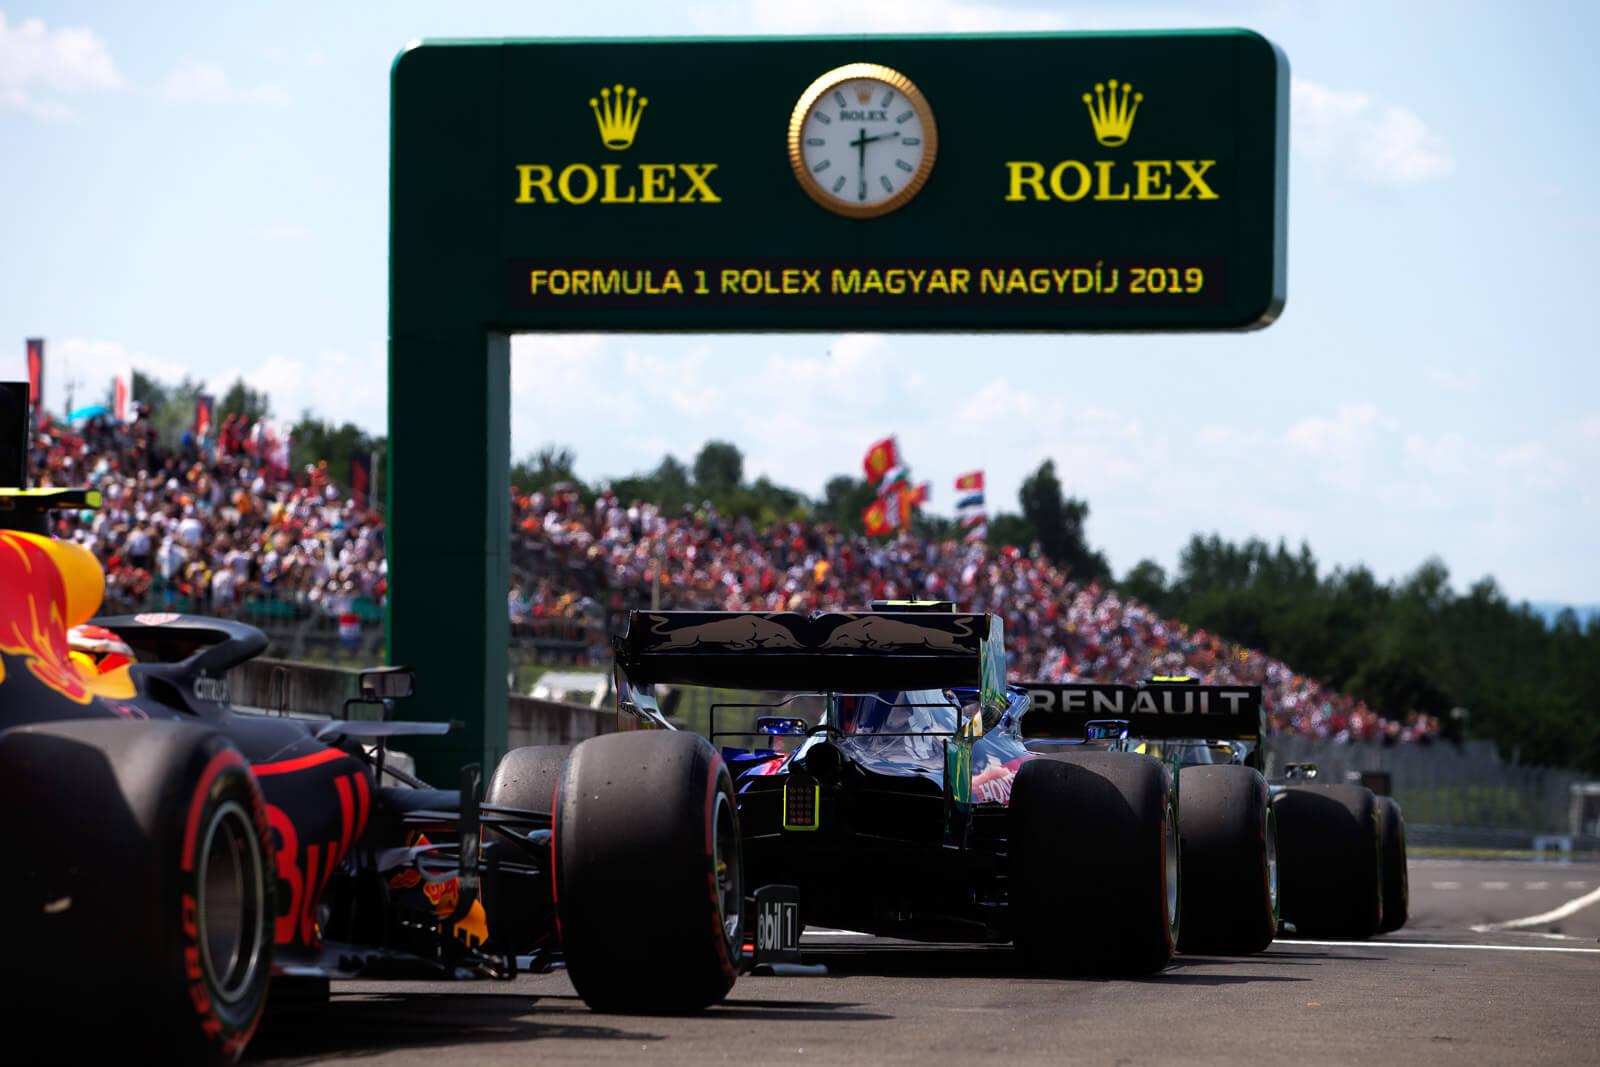 Sir Jackie Stewart & Formula 1 Rolex Magyar Nagydíj 2019